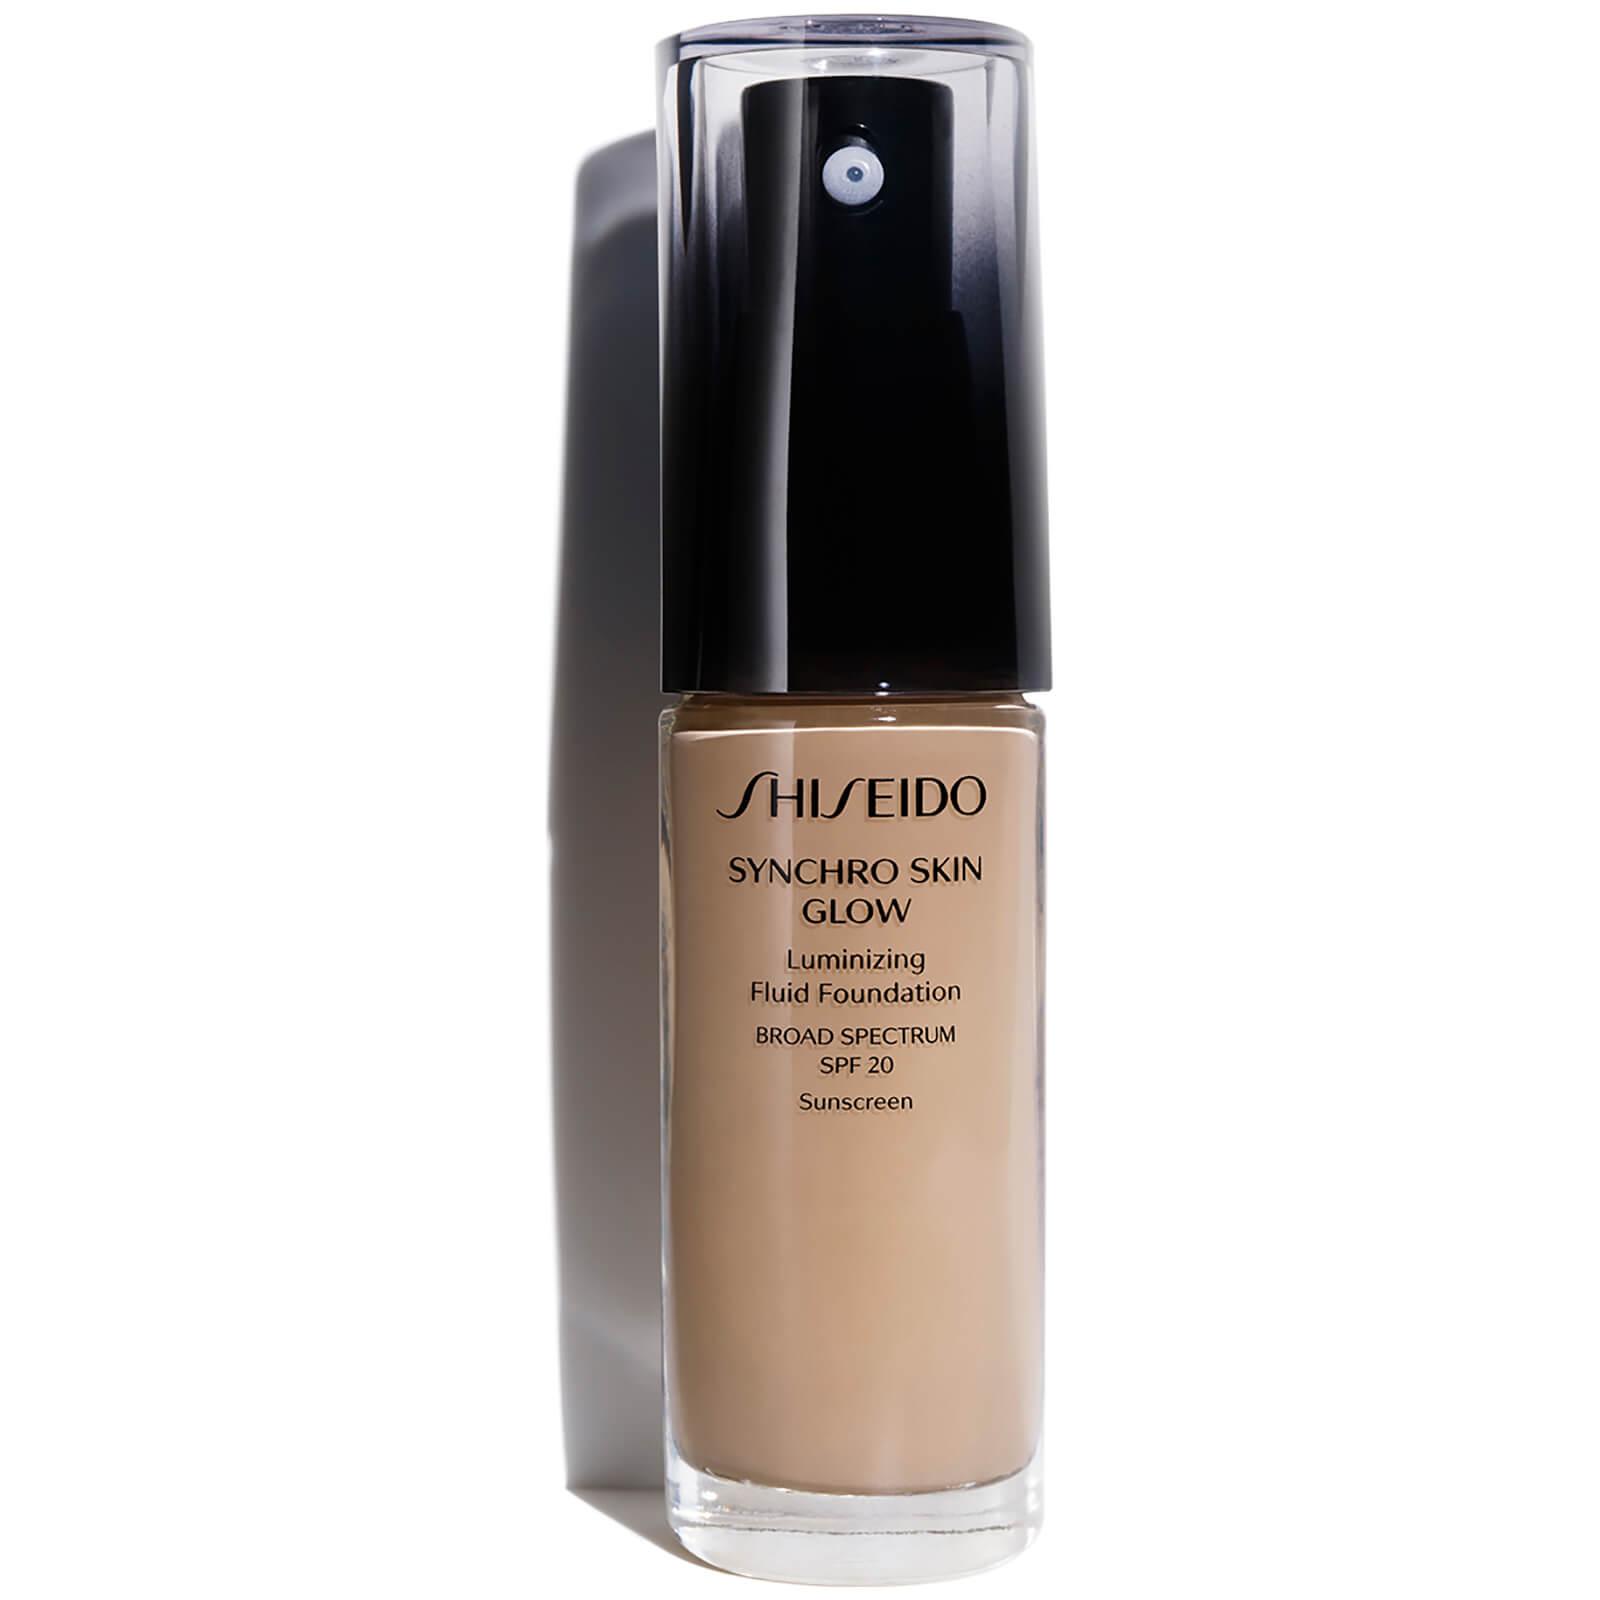 Shiseido Synchro Skin Glow Luminizing Foundation 30 ml (varie tonalità) - Neutral 4